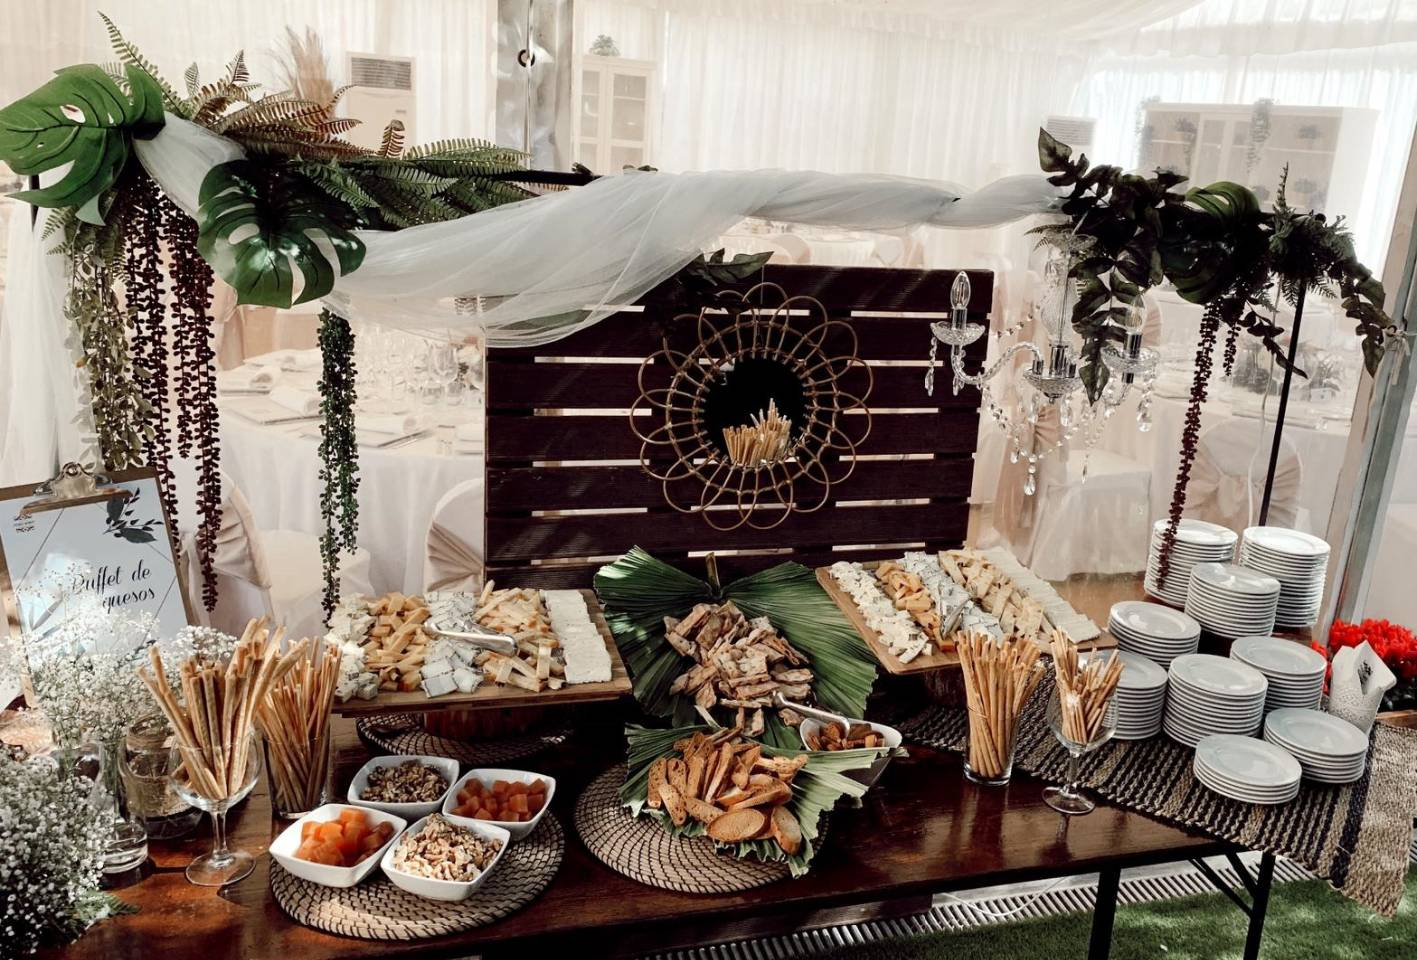 Buffet decoration 2